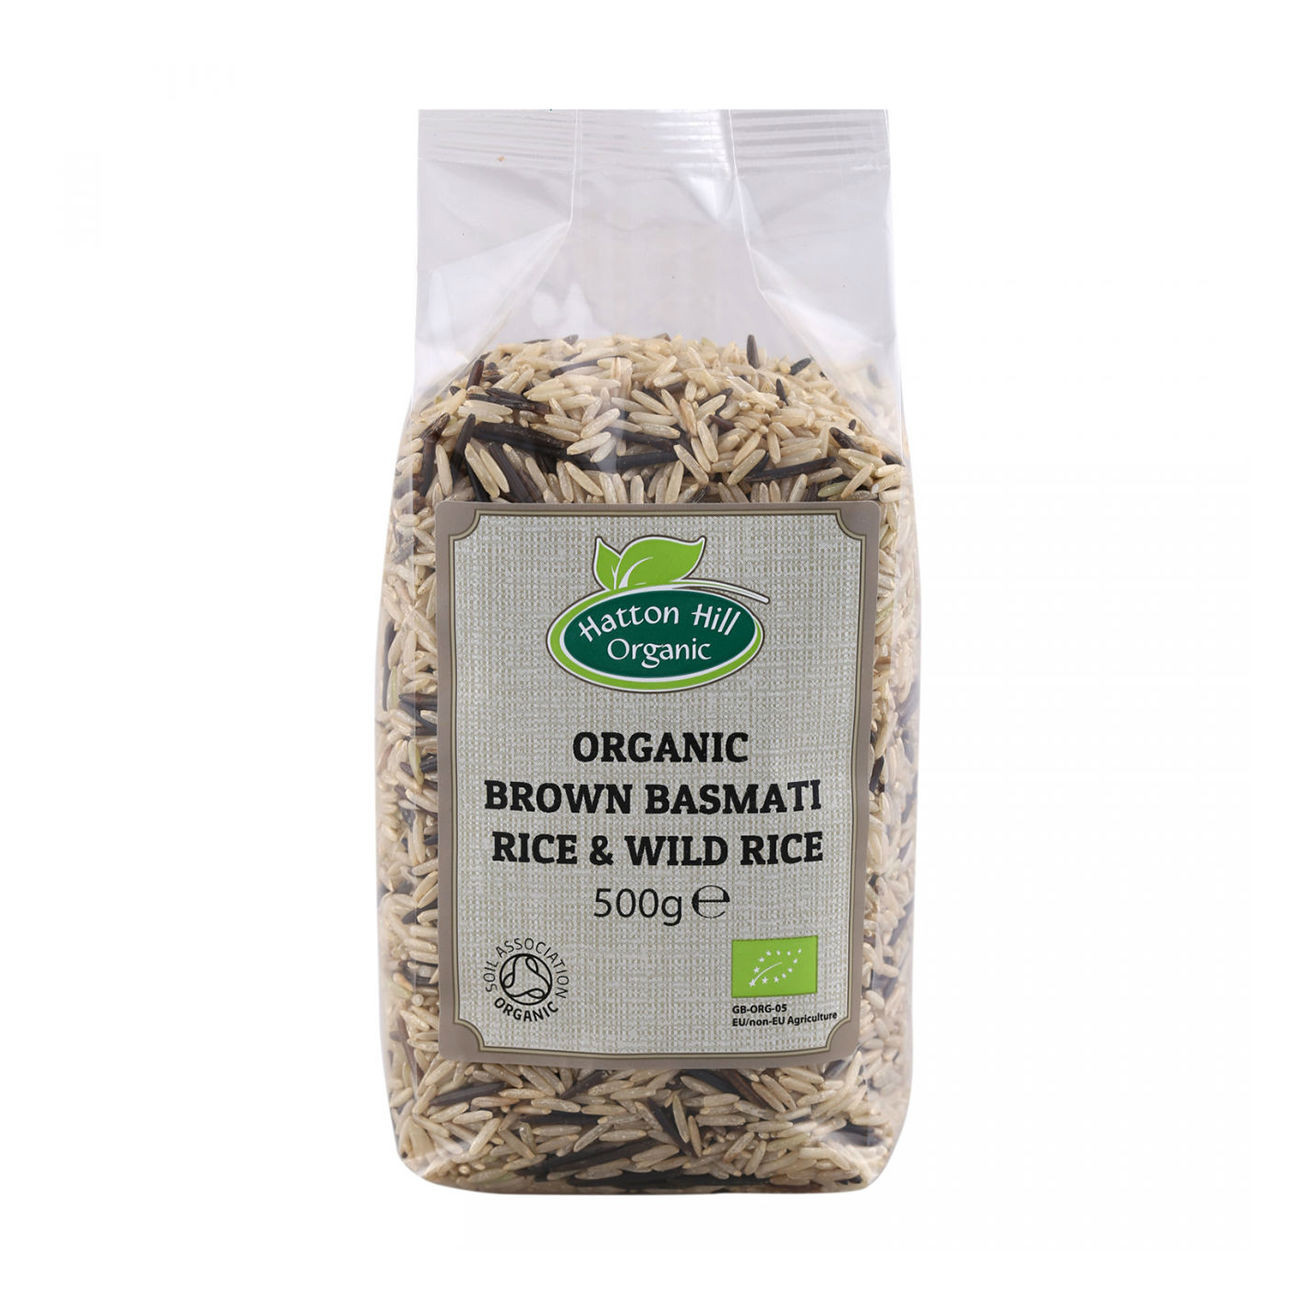 Organic Brown Basmati Rice  Organic Brown Basmati & Wild Rice 500g